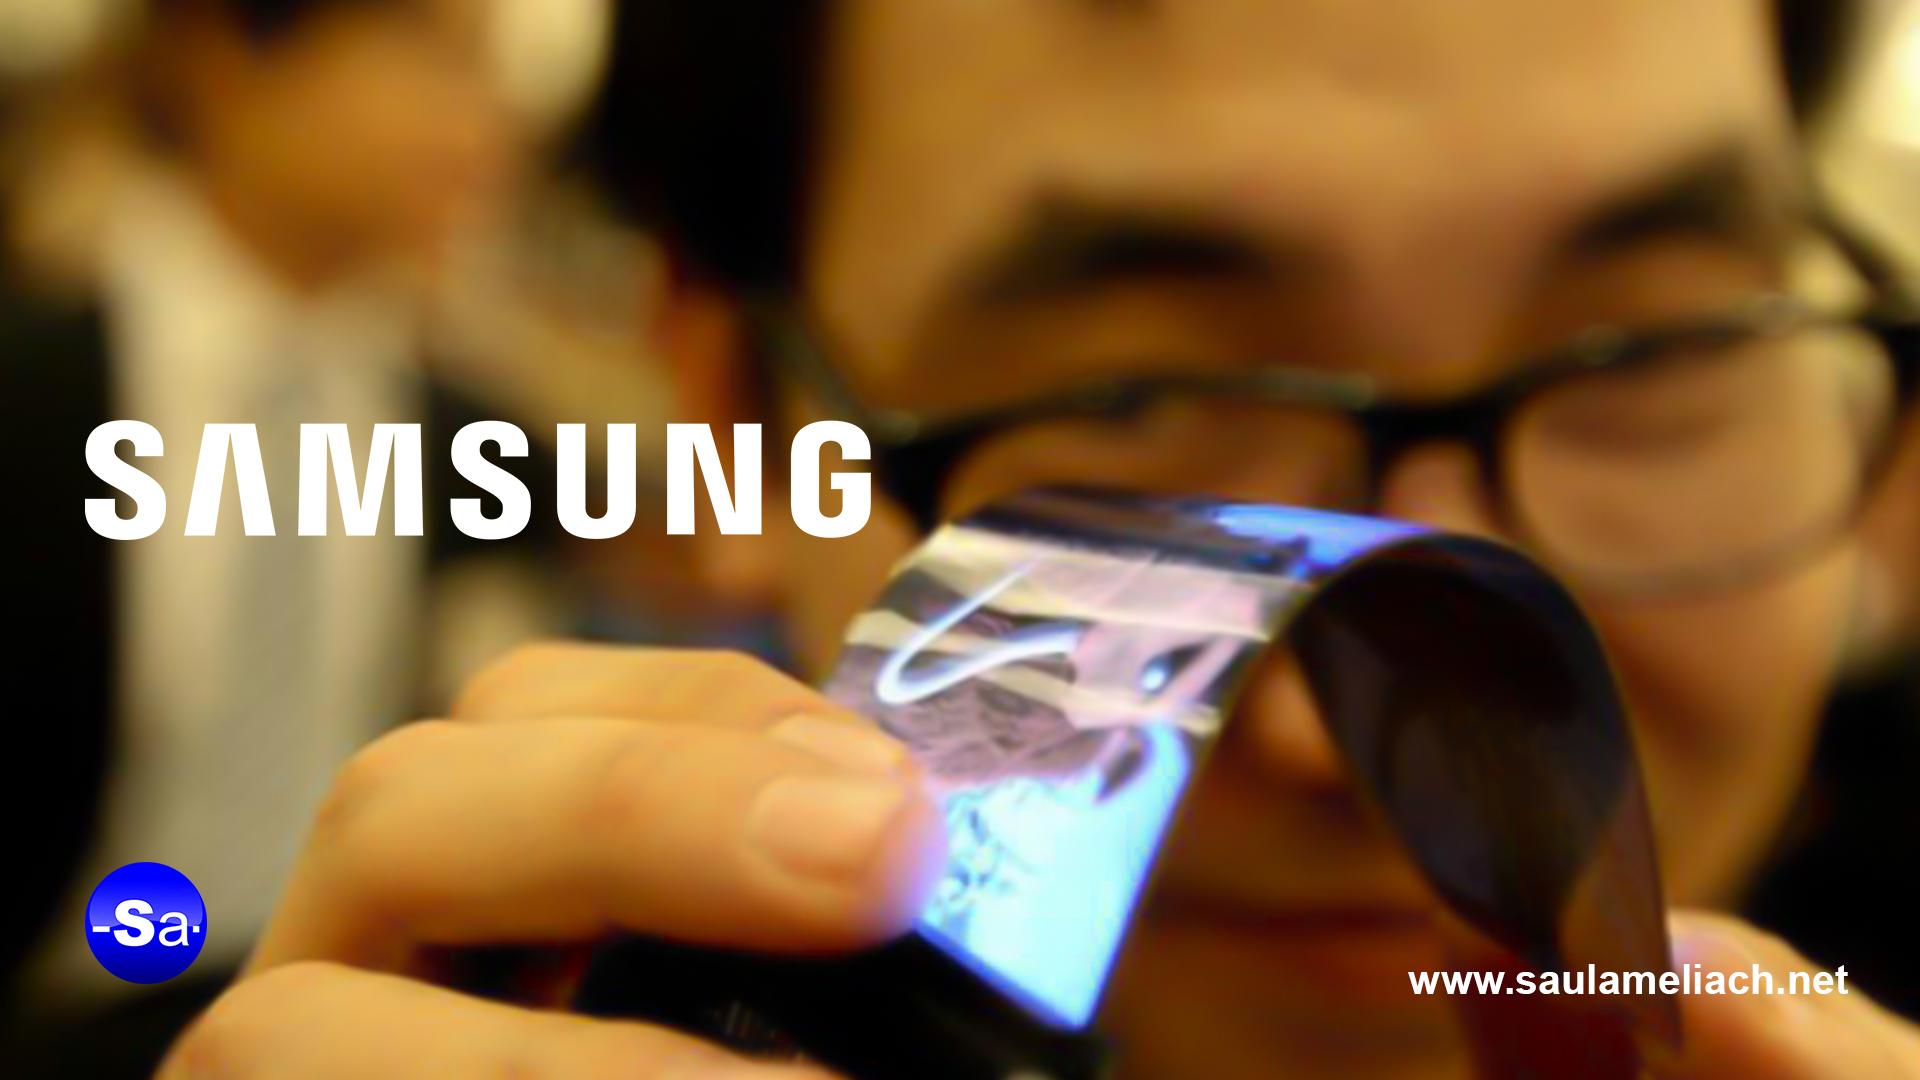 saul ameliach - Samsung